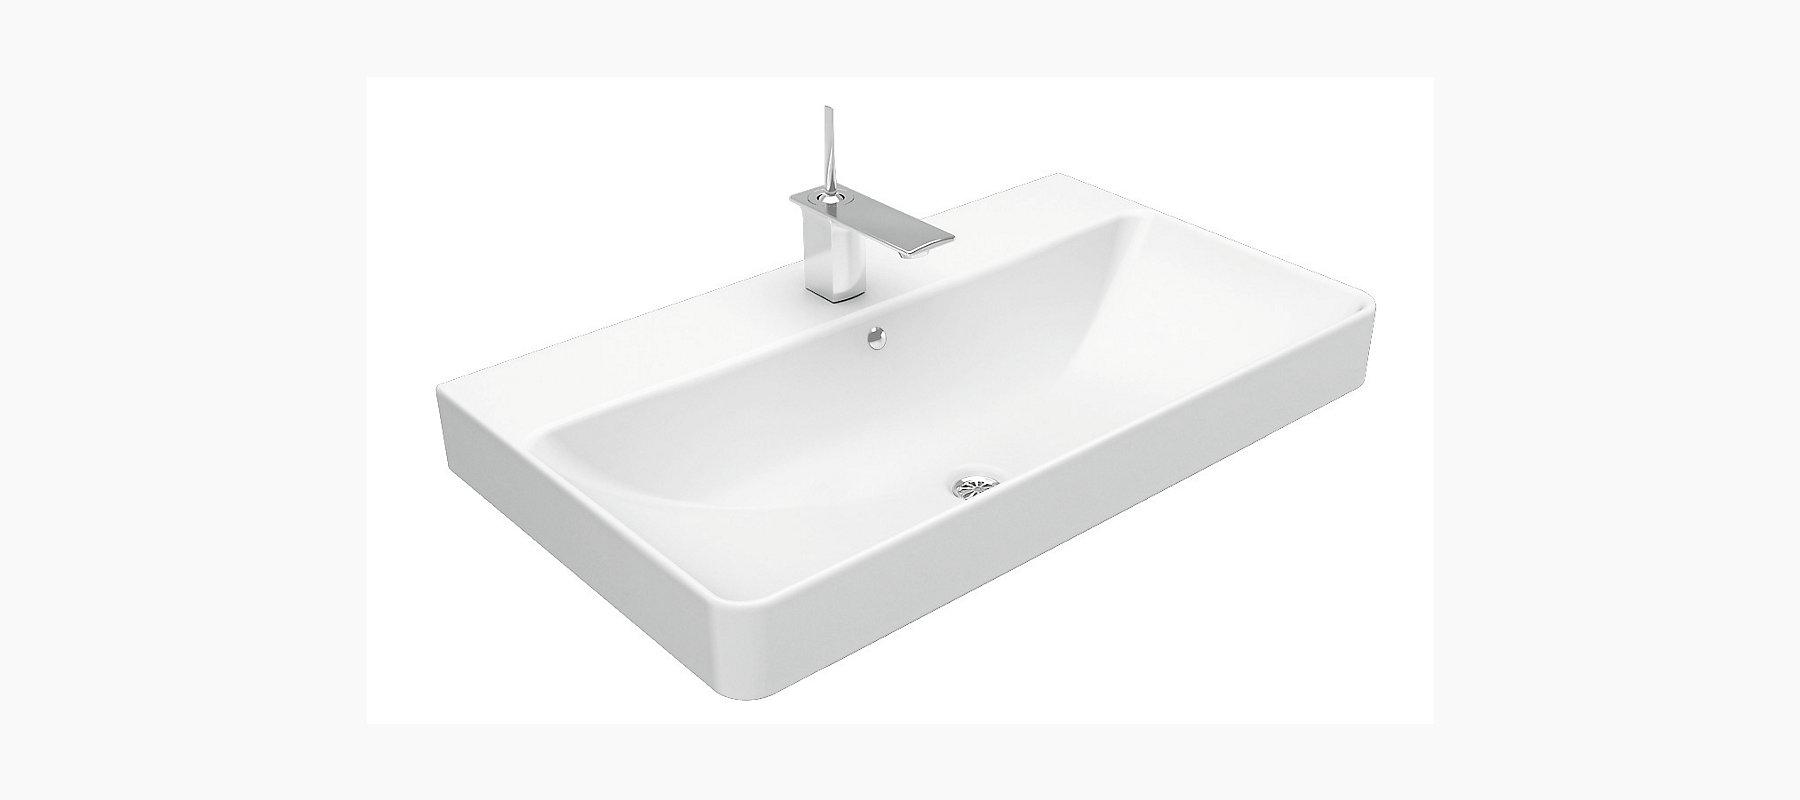 Kohler Bathroom Sinks India 1 Unique Kohler Oil Rubbed Bronze Bathroom Sink Faucet Square Drop